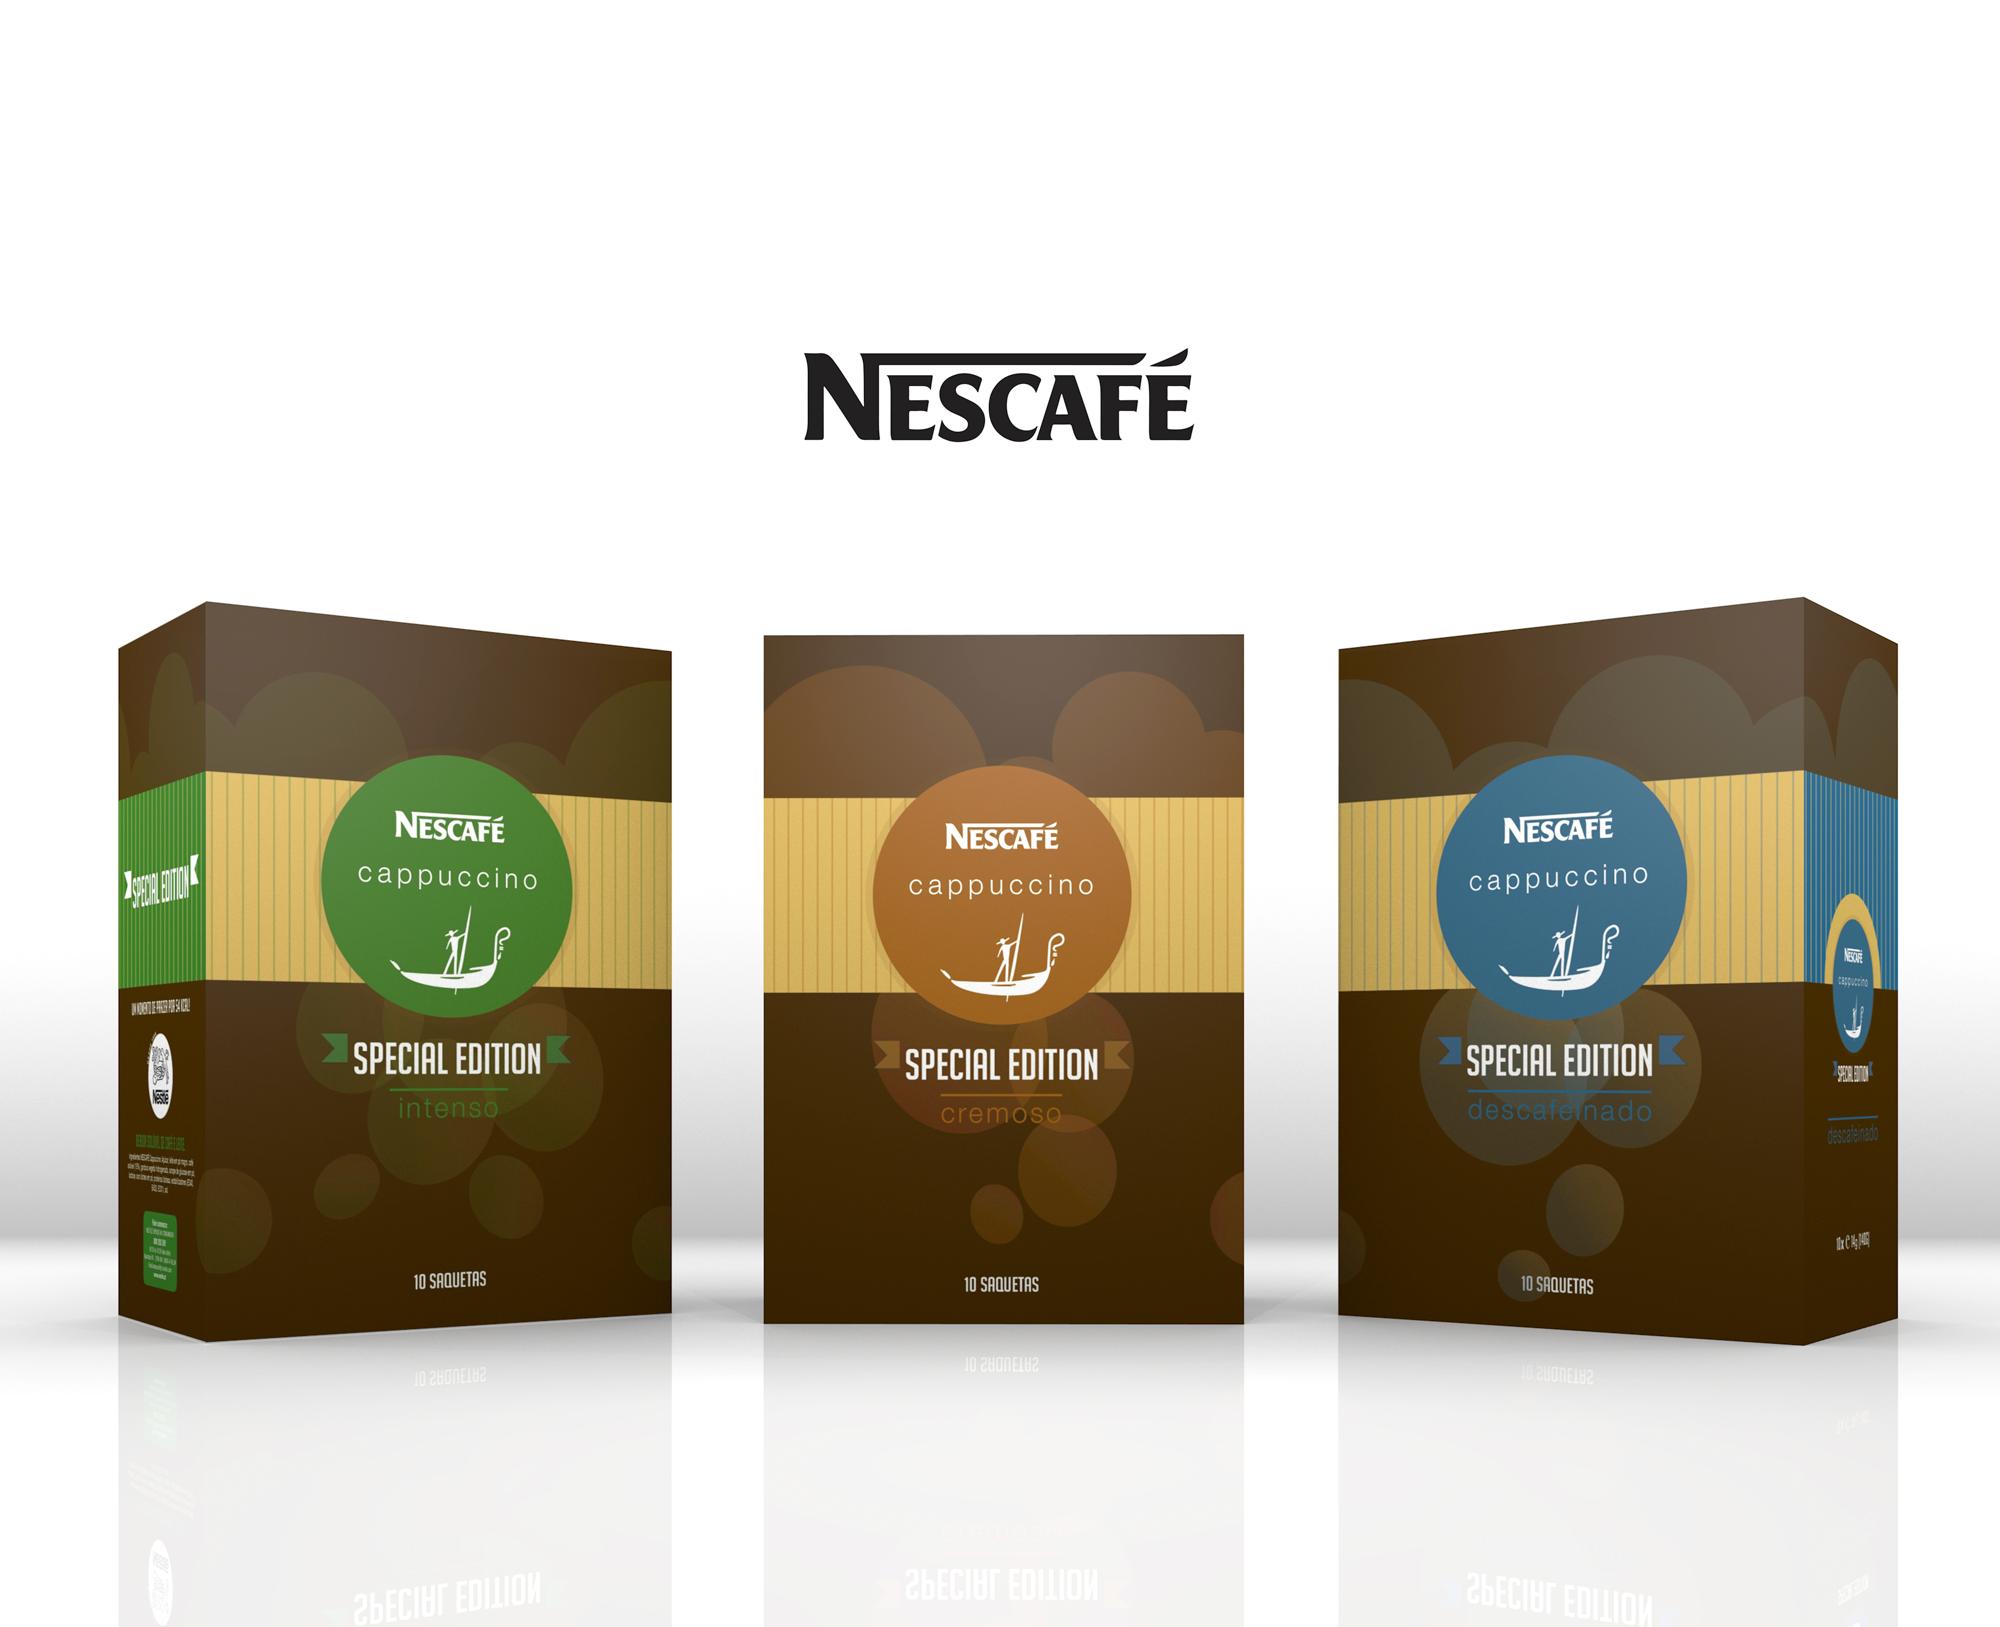 NESCAFÉ CAPPUCCINO special edition